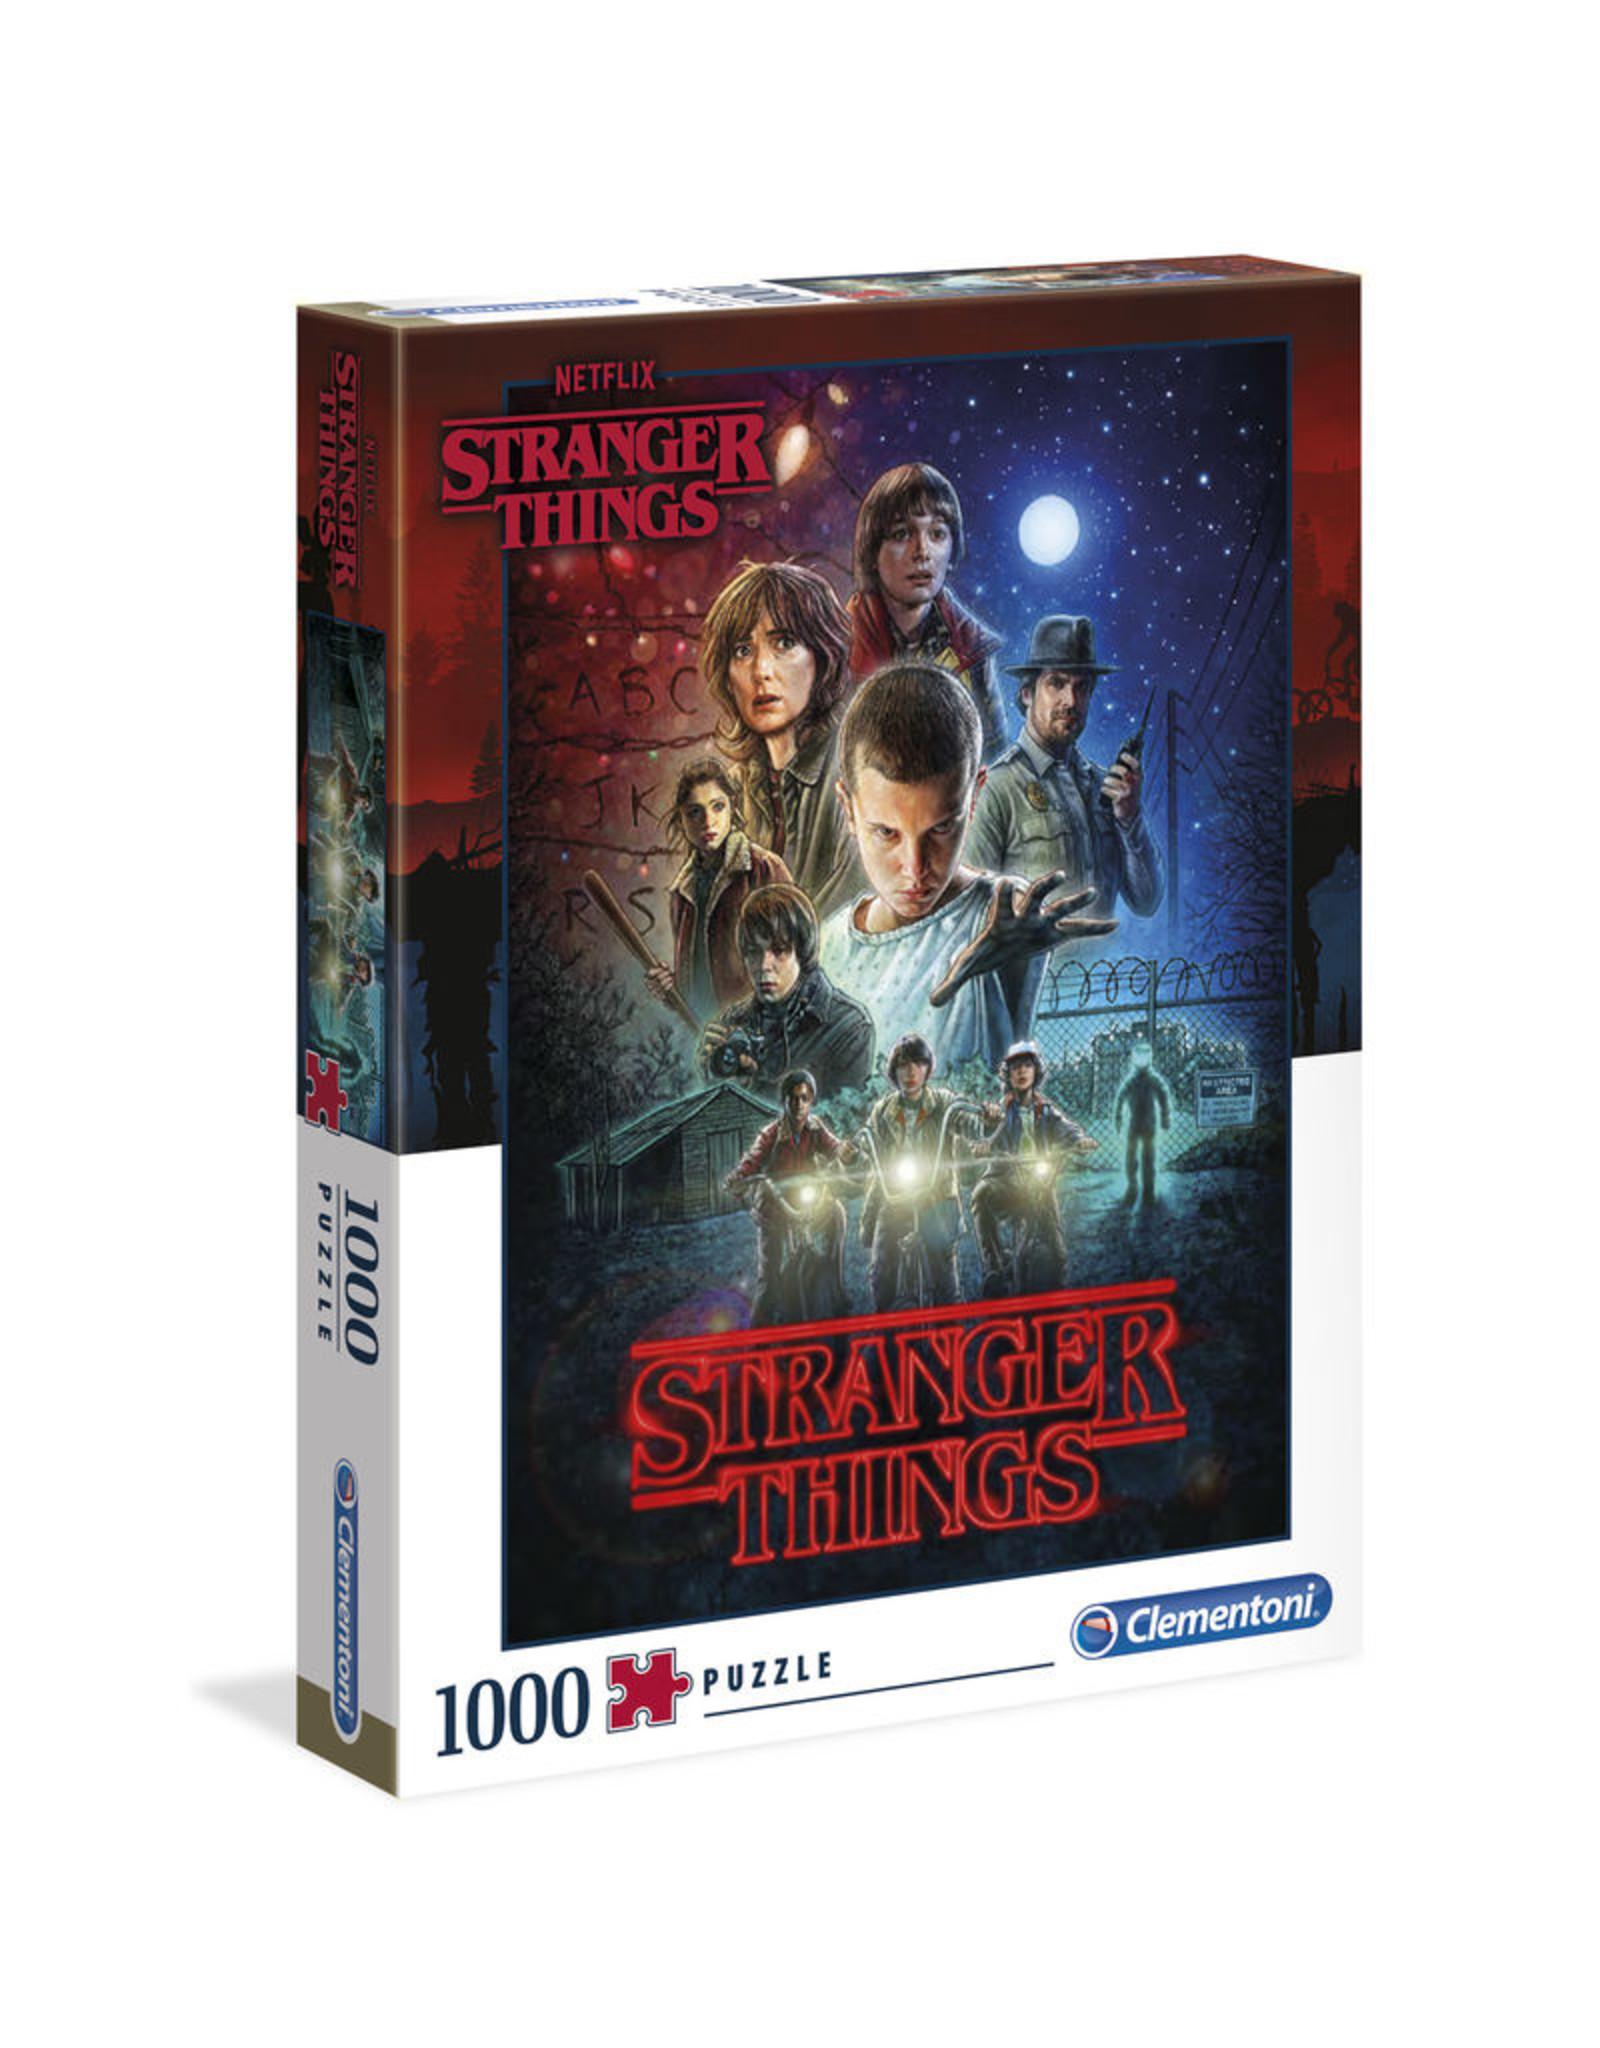 CLEMENTONI Stranger Things Poster Season 1 puzzel 1000 st.